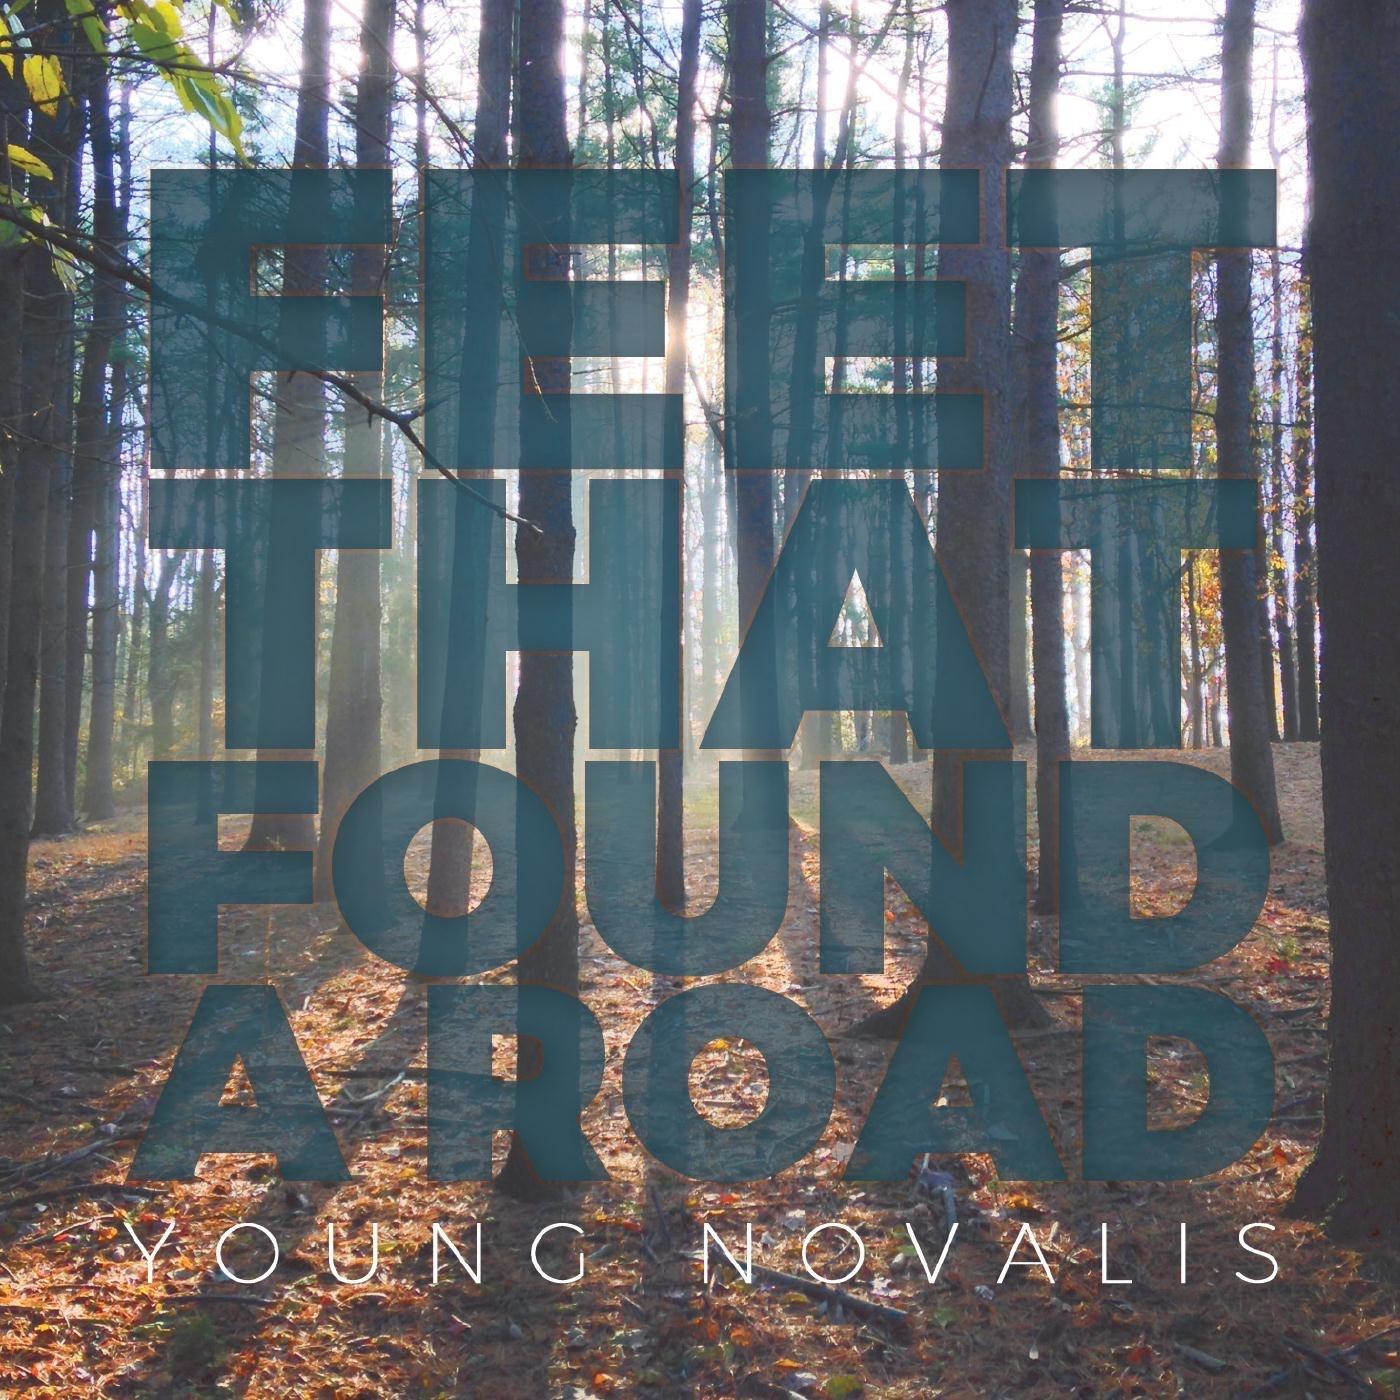 Feet That Found a Road - EP